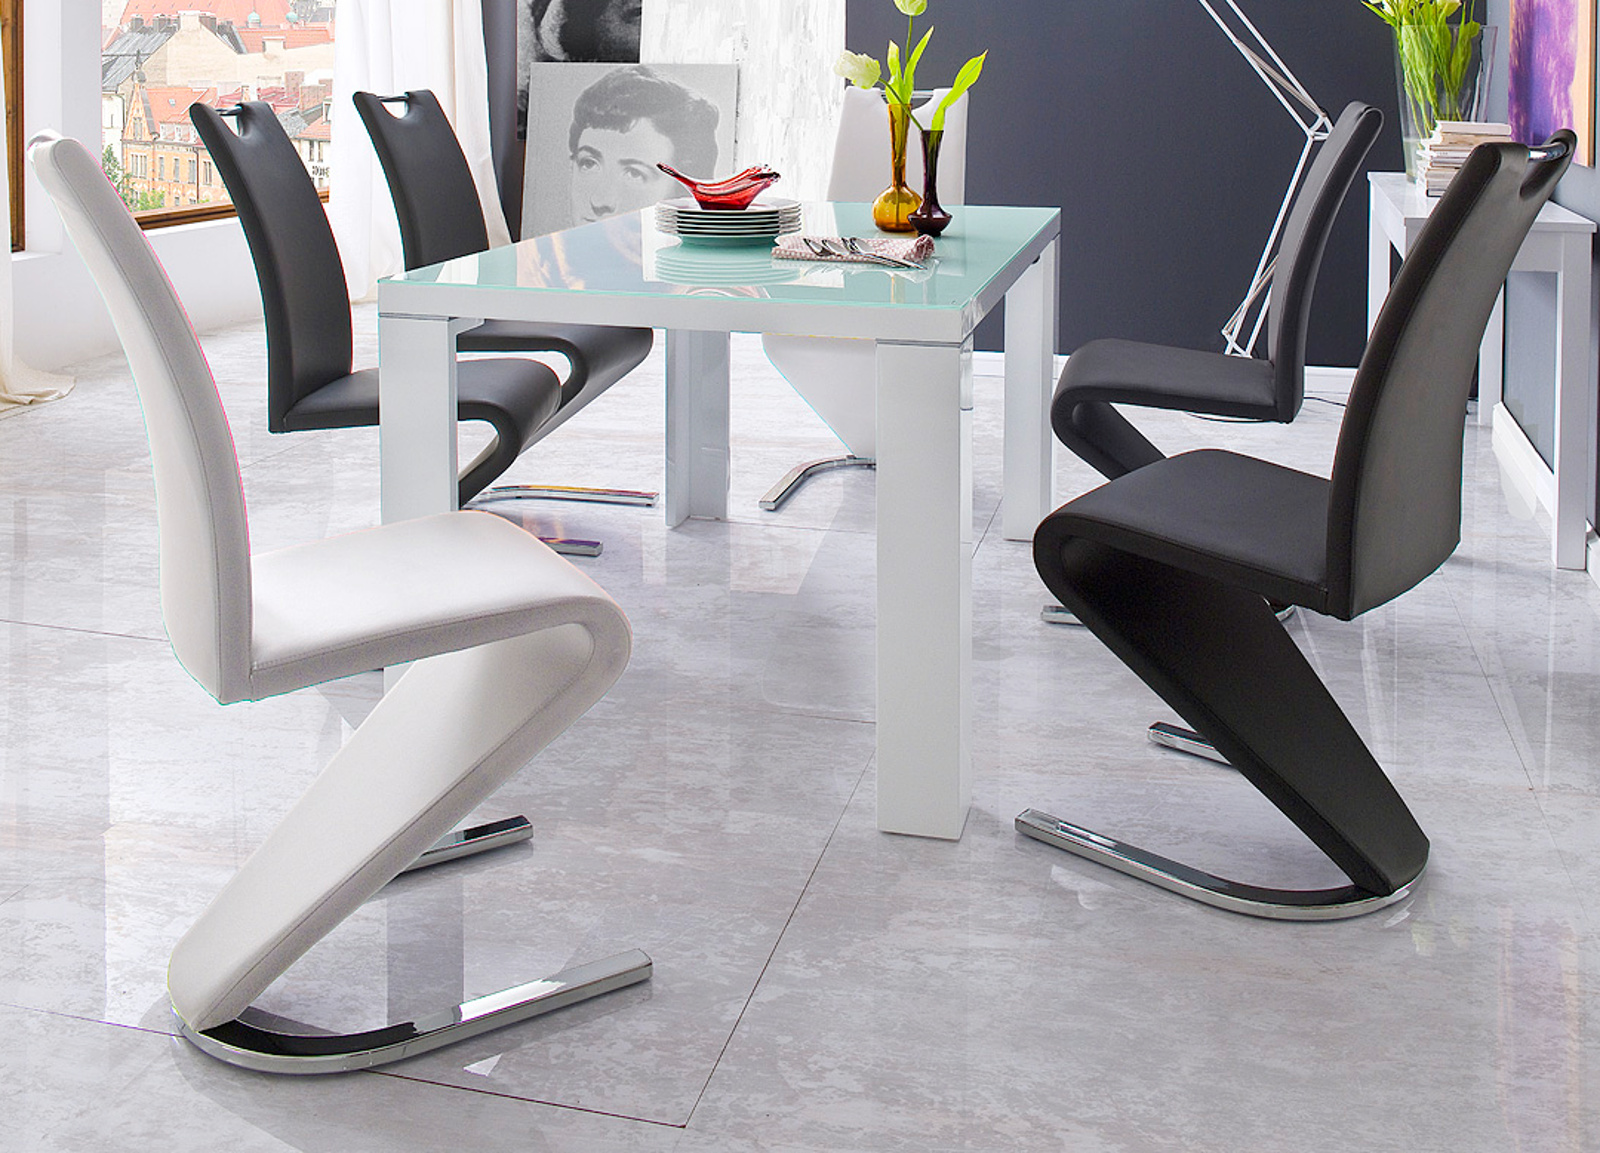 Büromöbel weiss grau  Moderne Büromöbel in Ahorn -